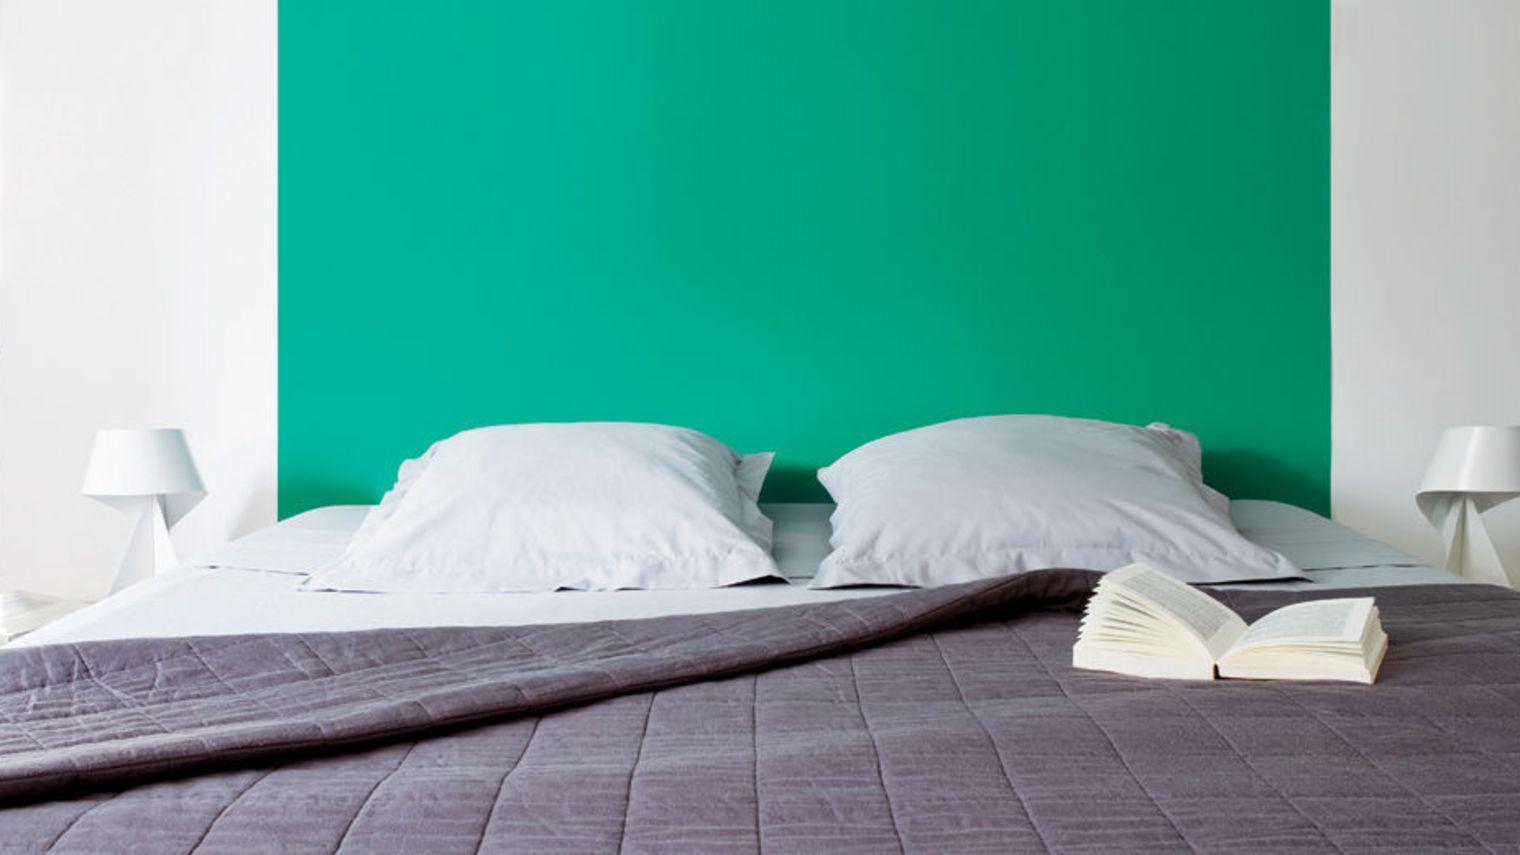 Déco chambre vert emeraude - Exemples d\'aménagements